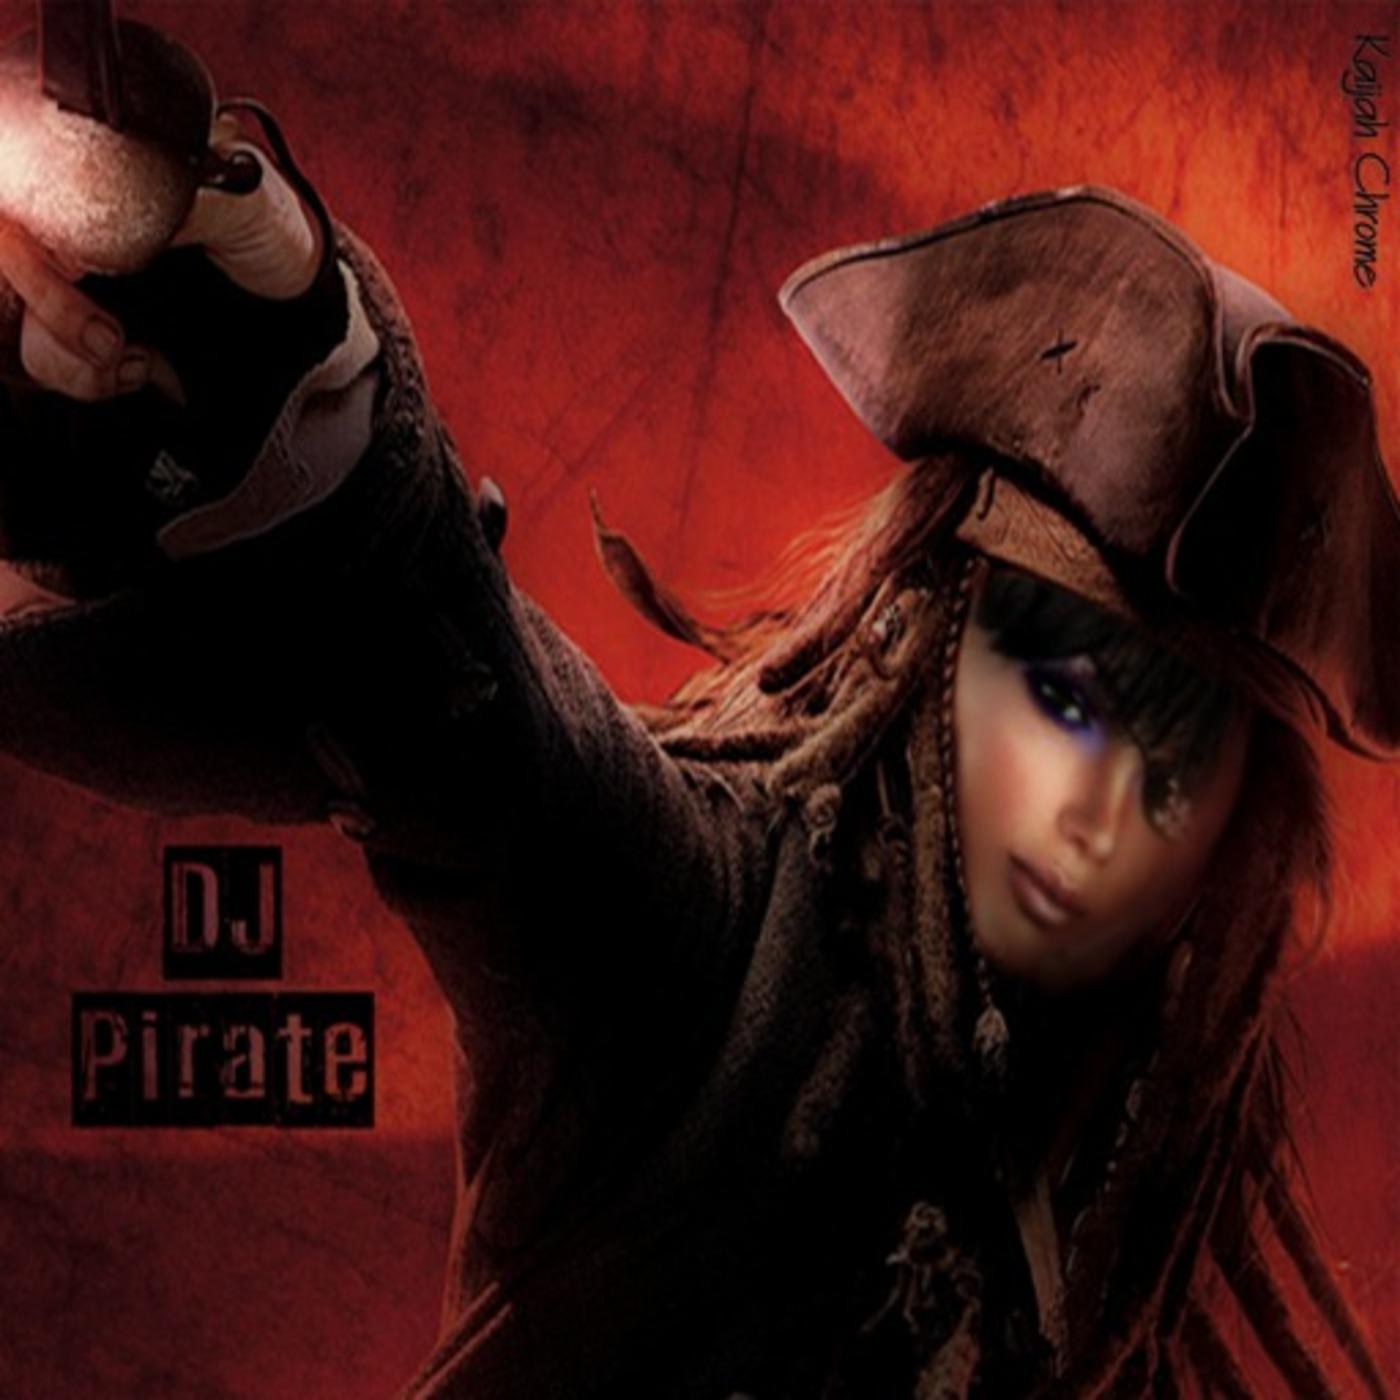 DJ Pirate's Rum & Cokelahoma Show On ENT SL Radio 08/06/2019 DJ